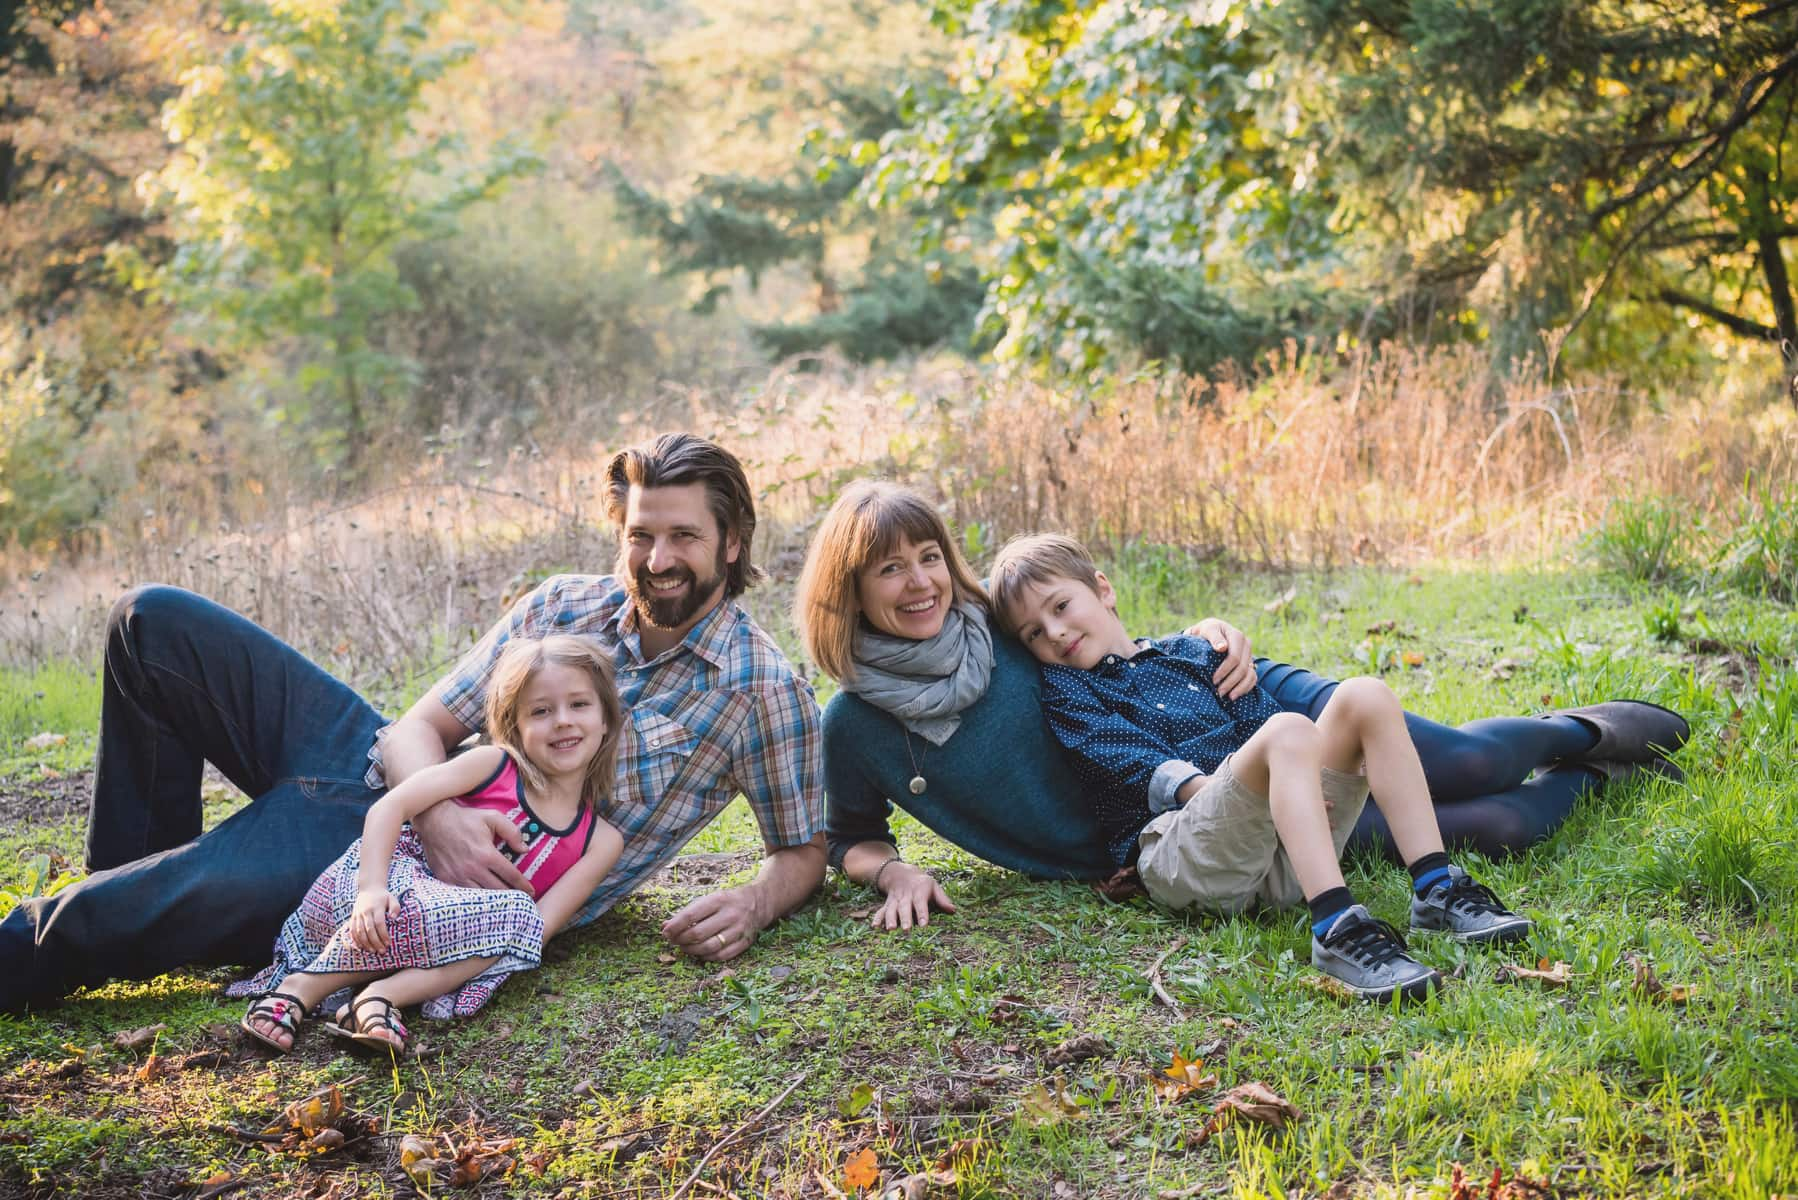 Family Portrait by Abigayle Tarsches